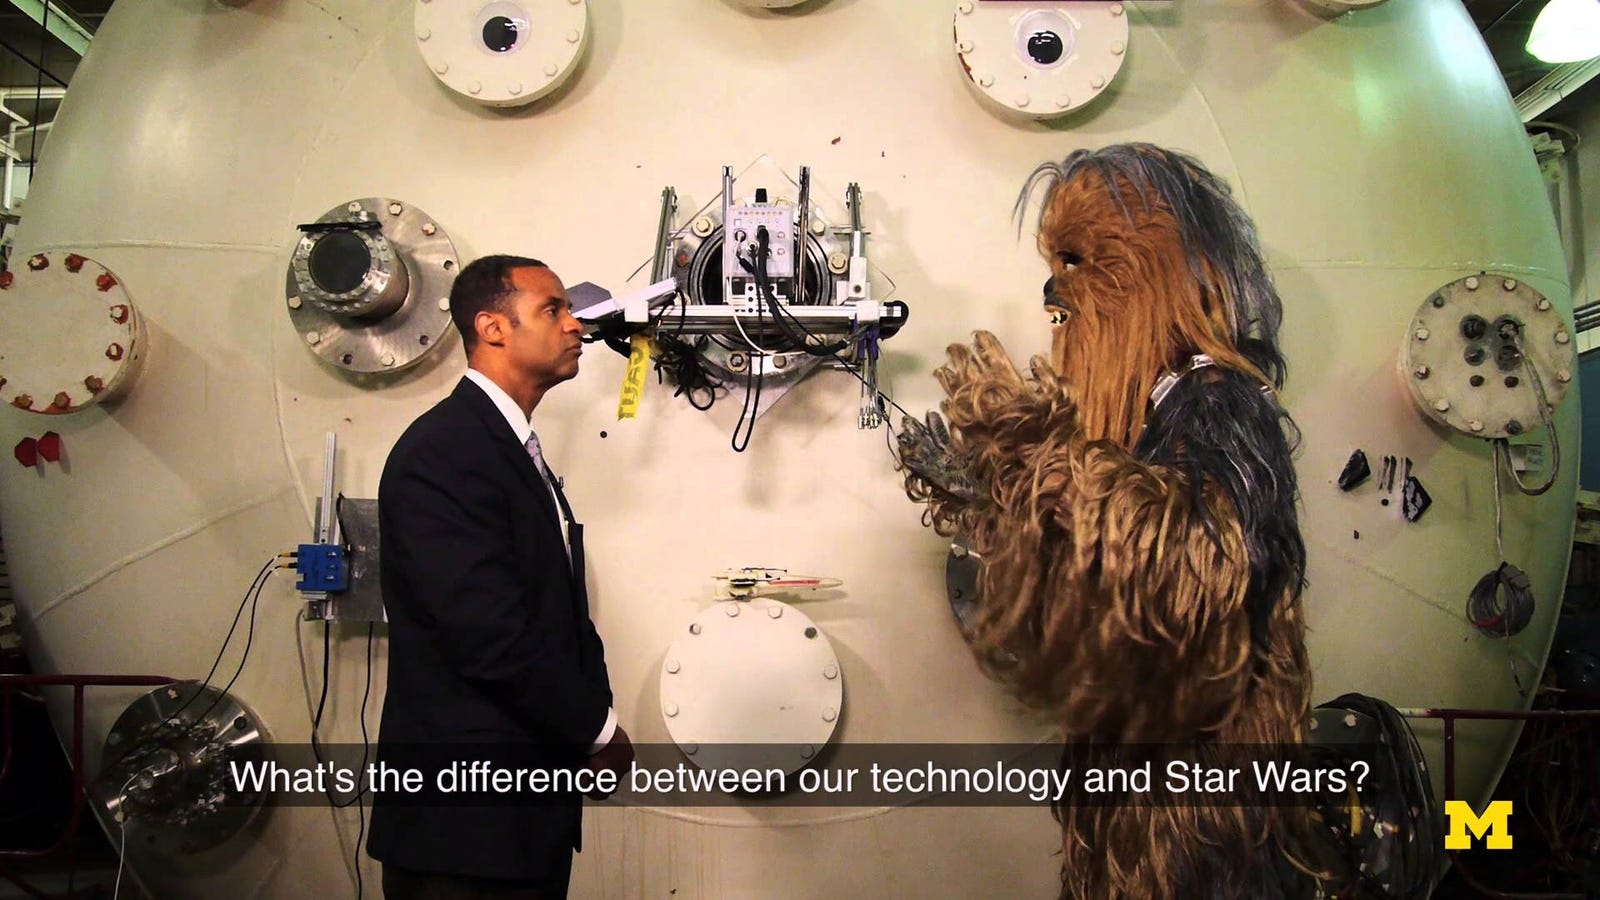 Watch Chewie Interview a Rocket Scientist About Advanced Propulsion Systems